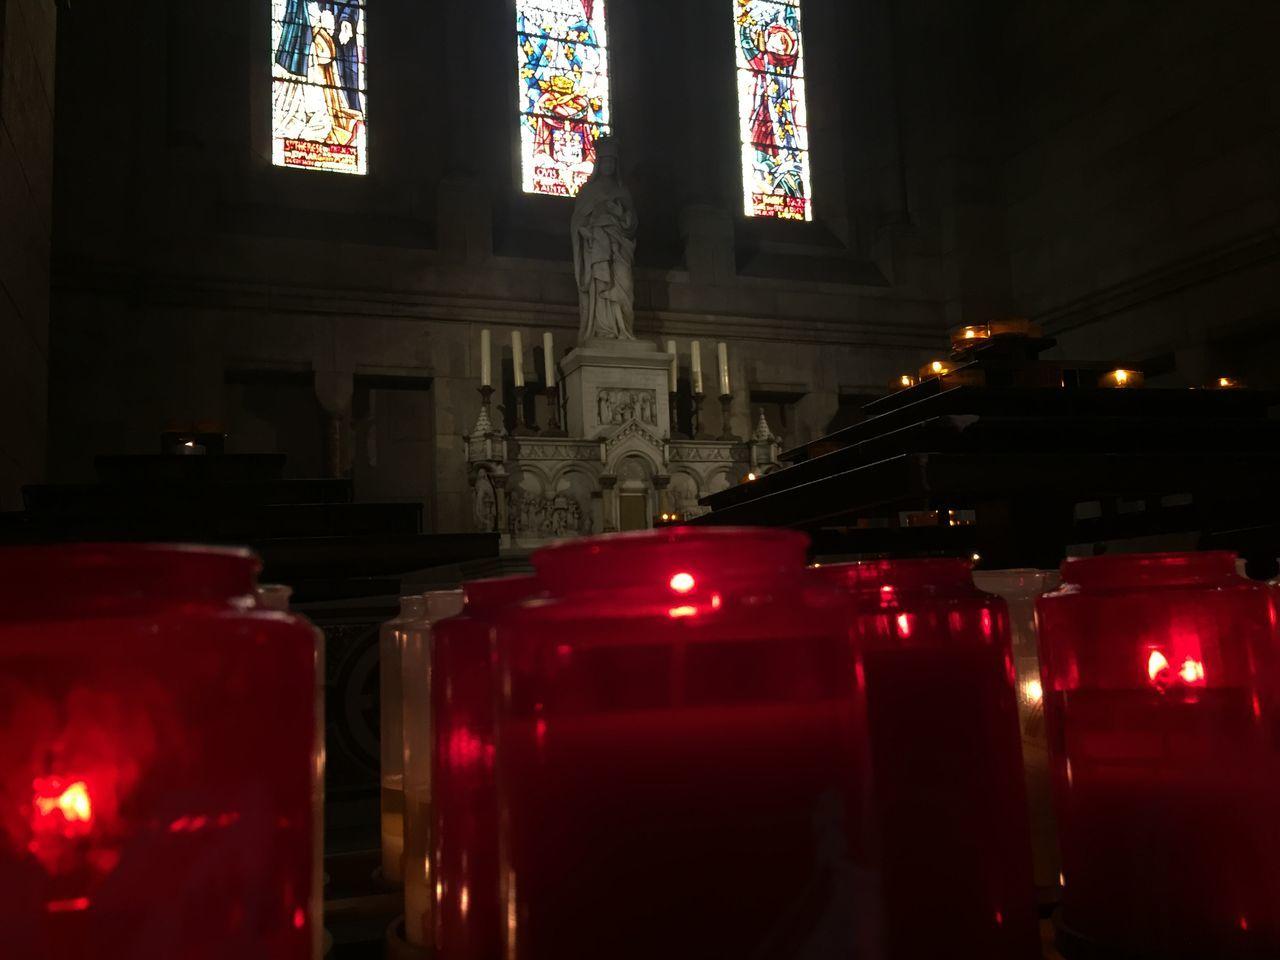 Cande Candles Fé Faith Church Red